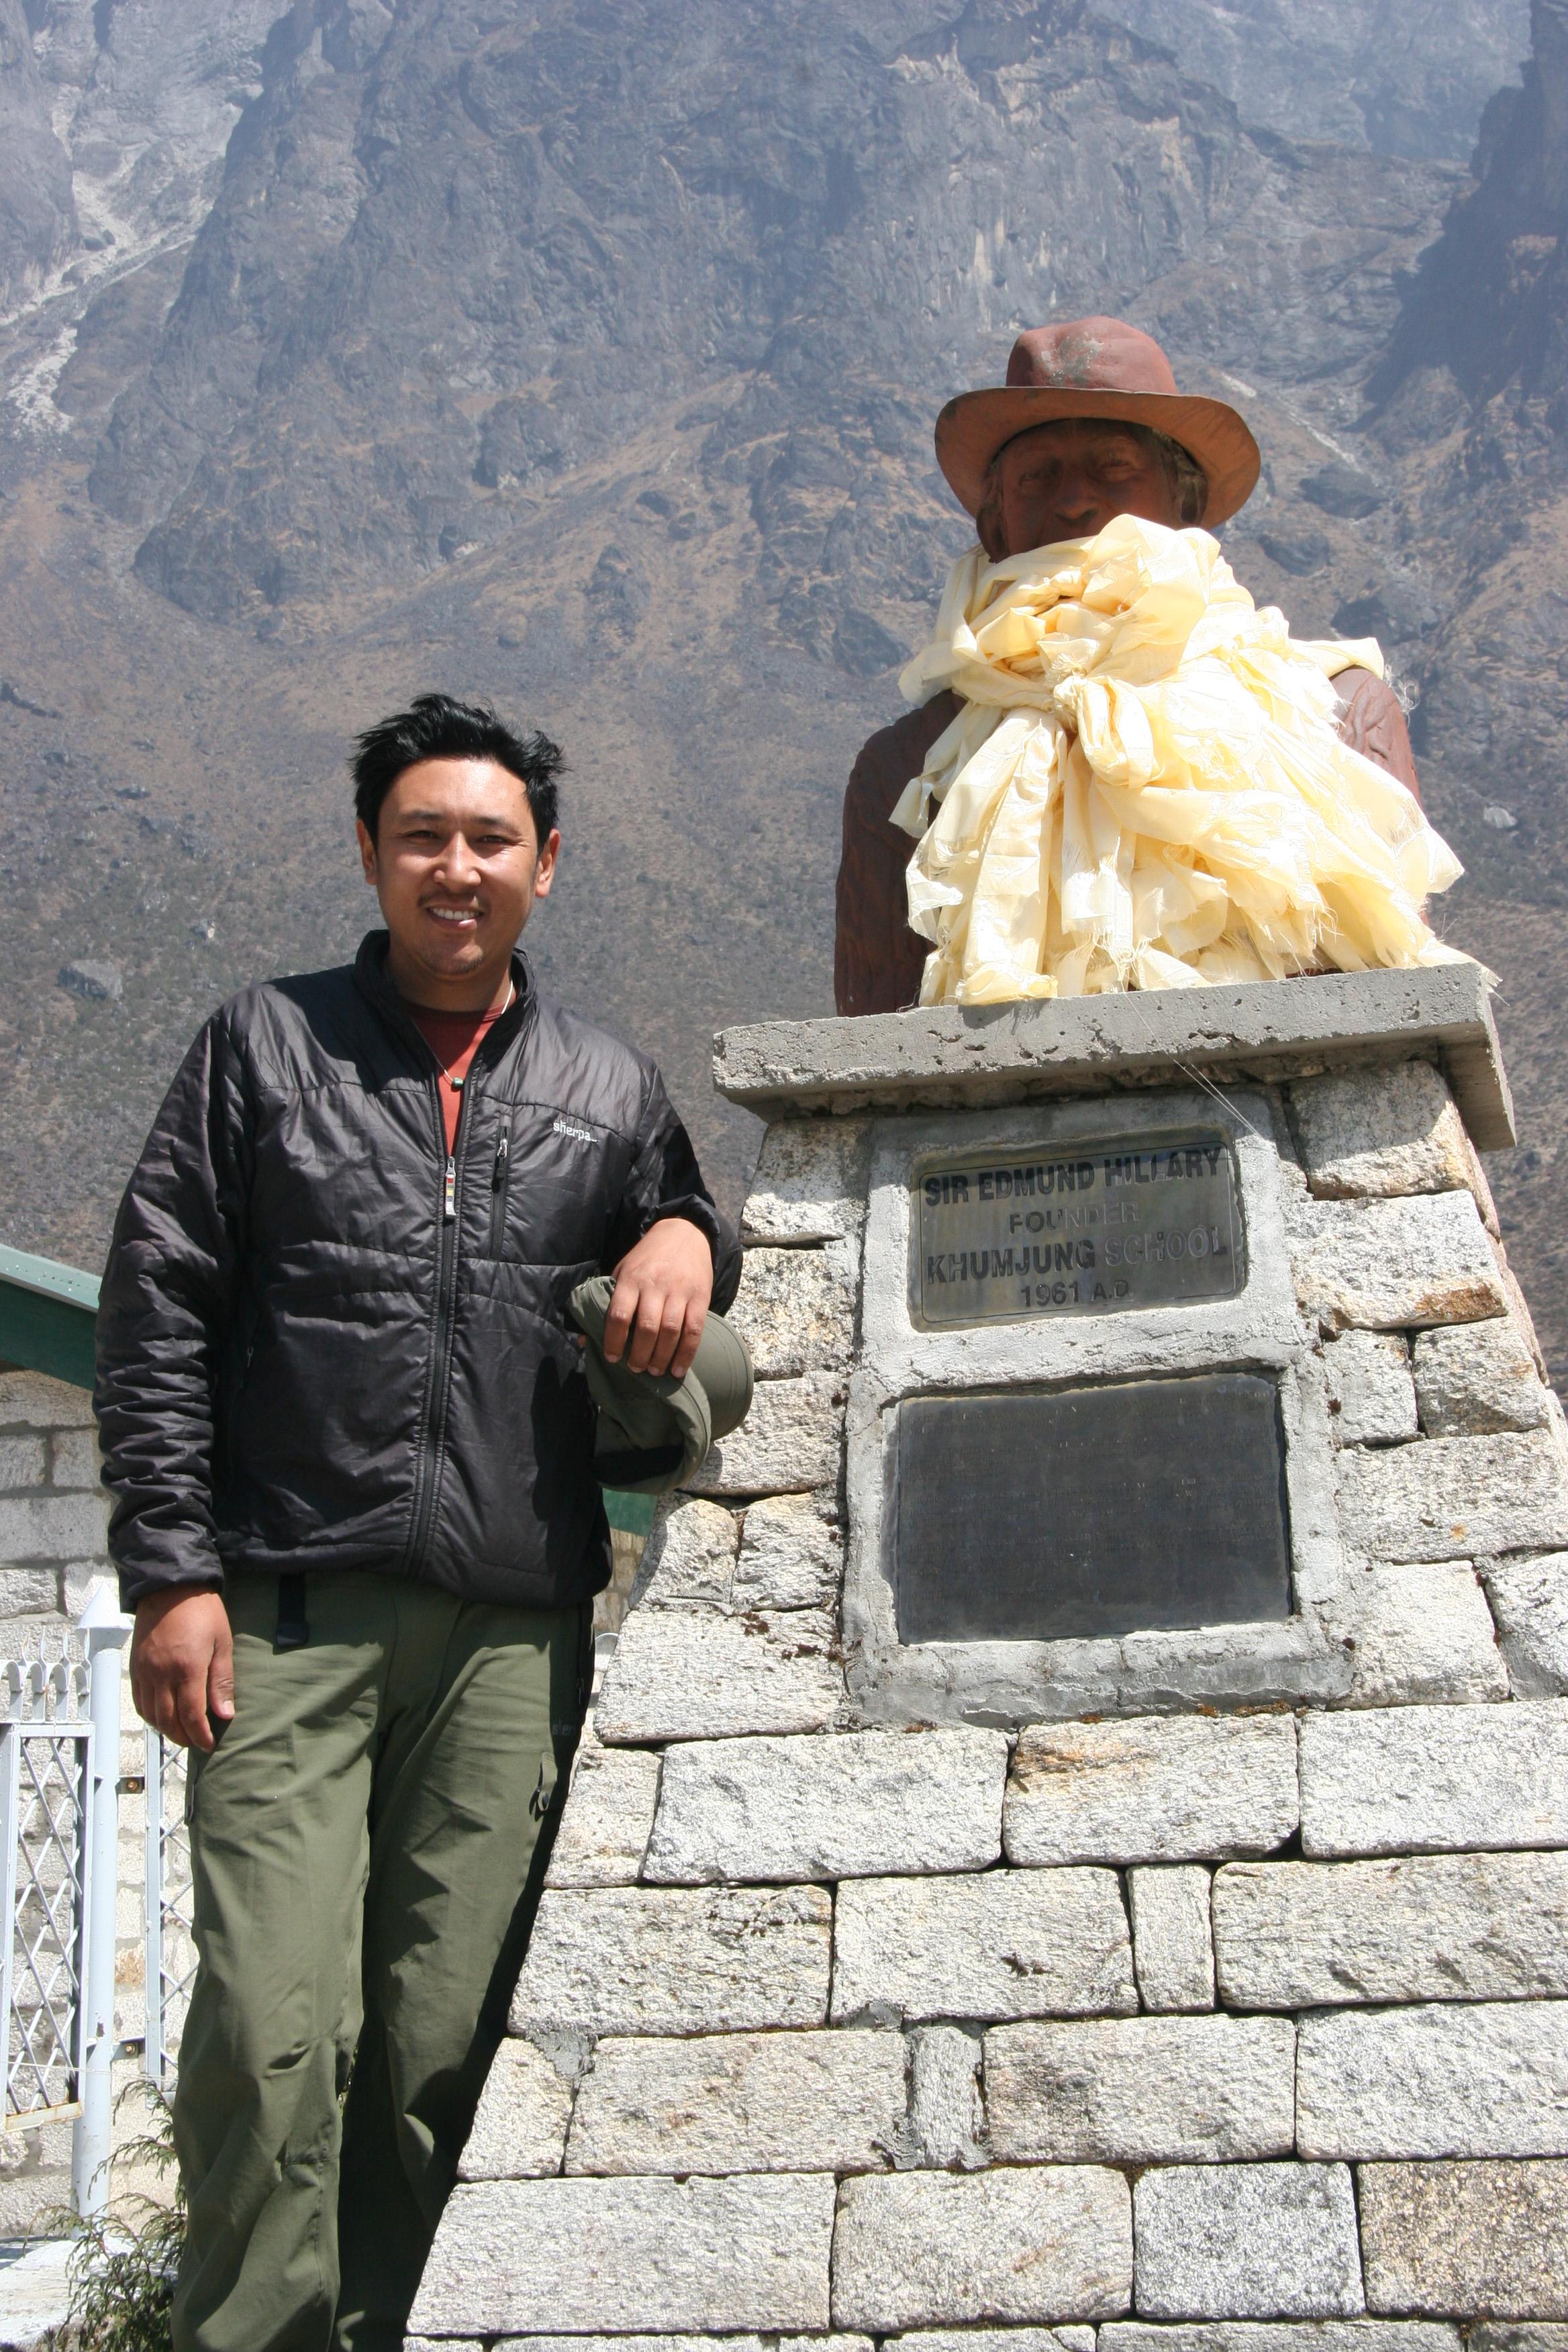 Mingma next to statue of sir edmund hillary